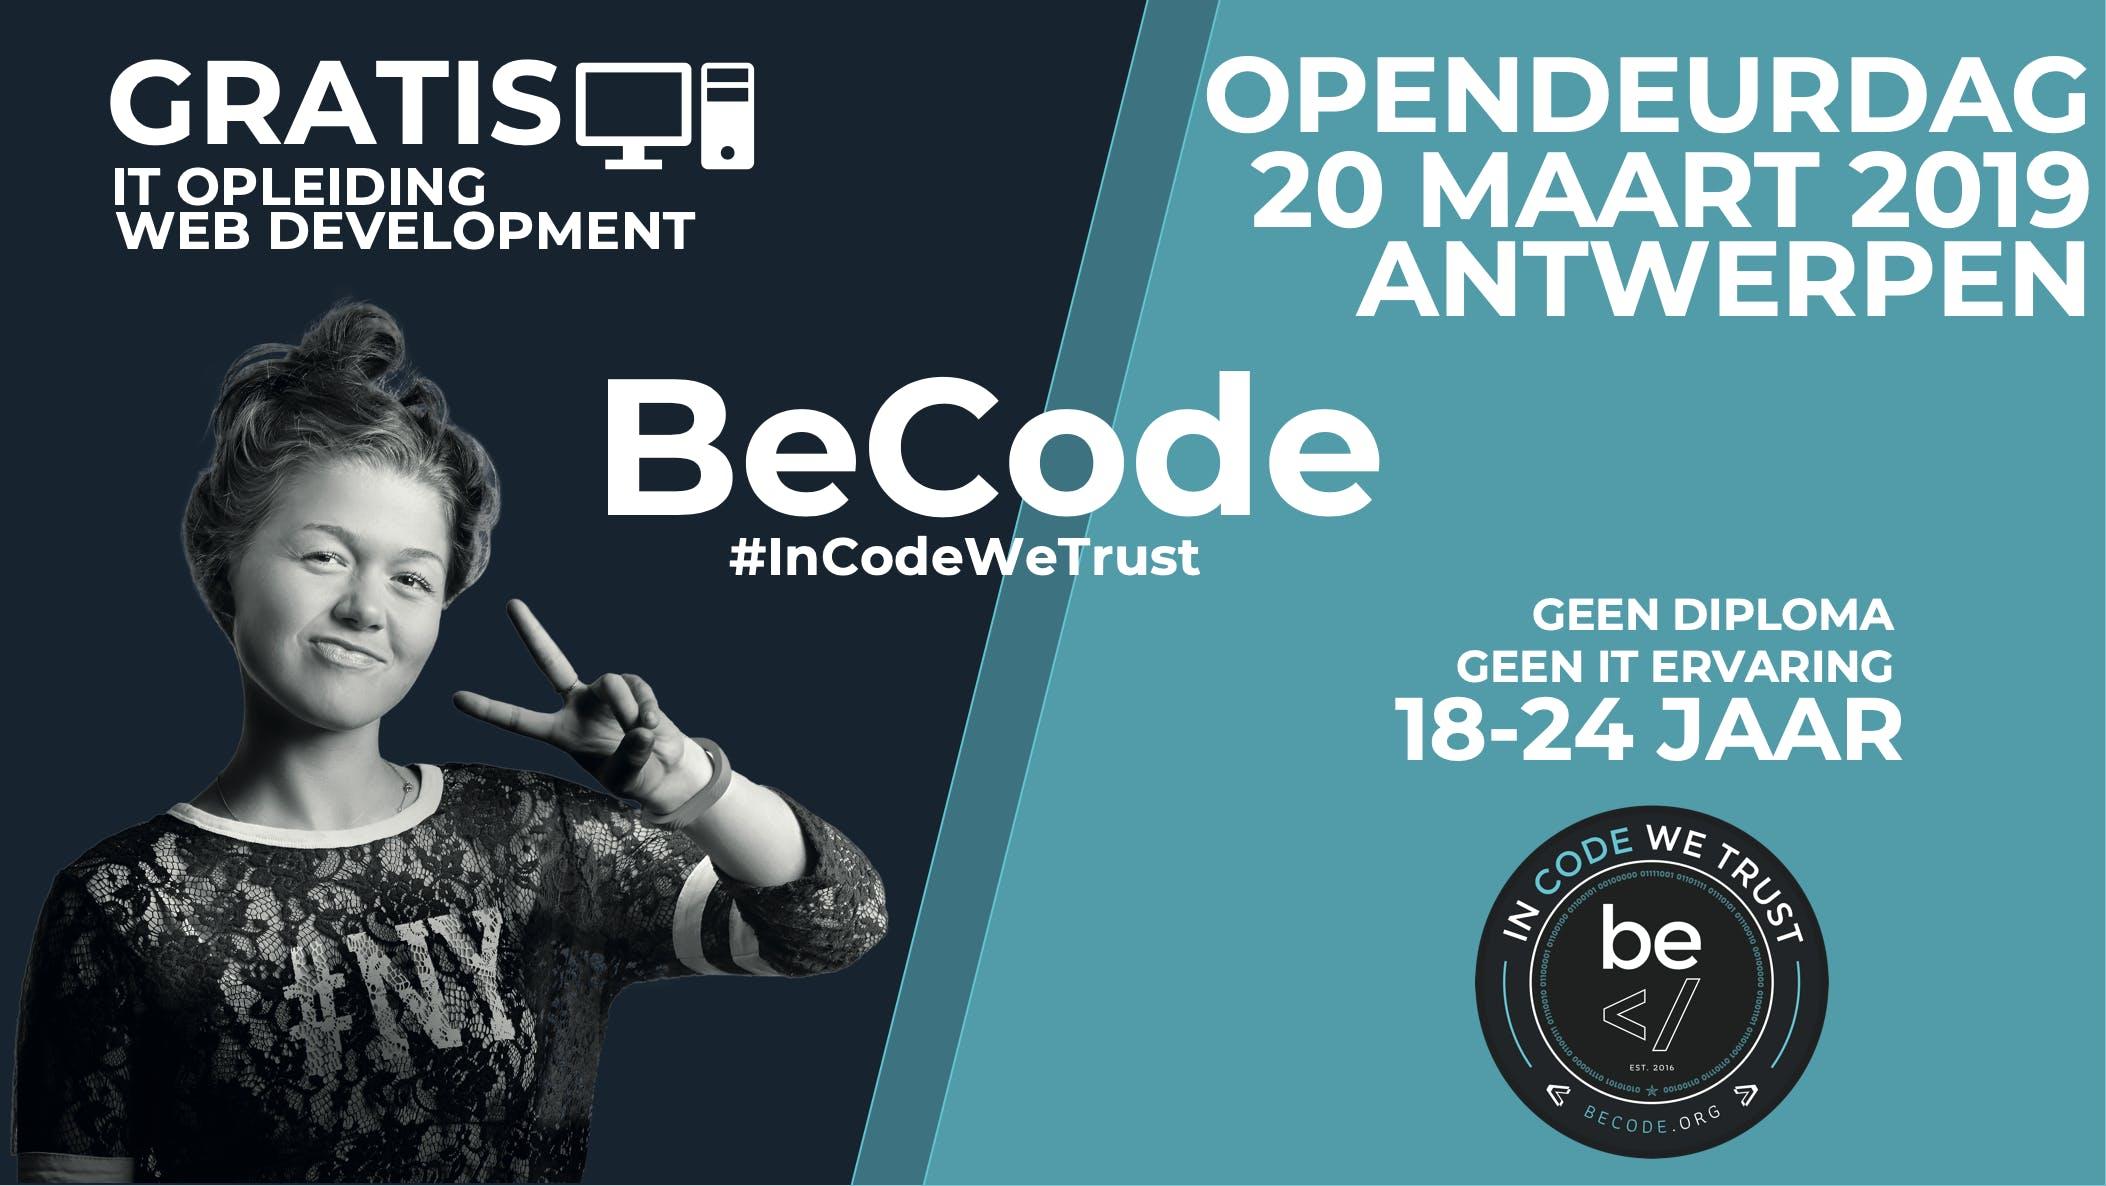 Opendeurdag BECODE Antwerpen (Tolhuis/ The be